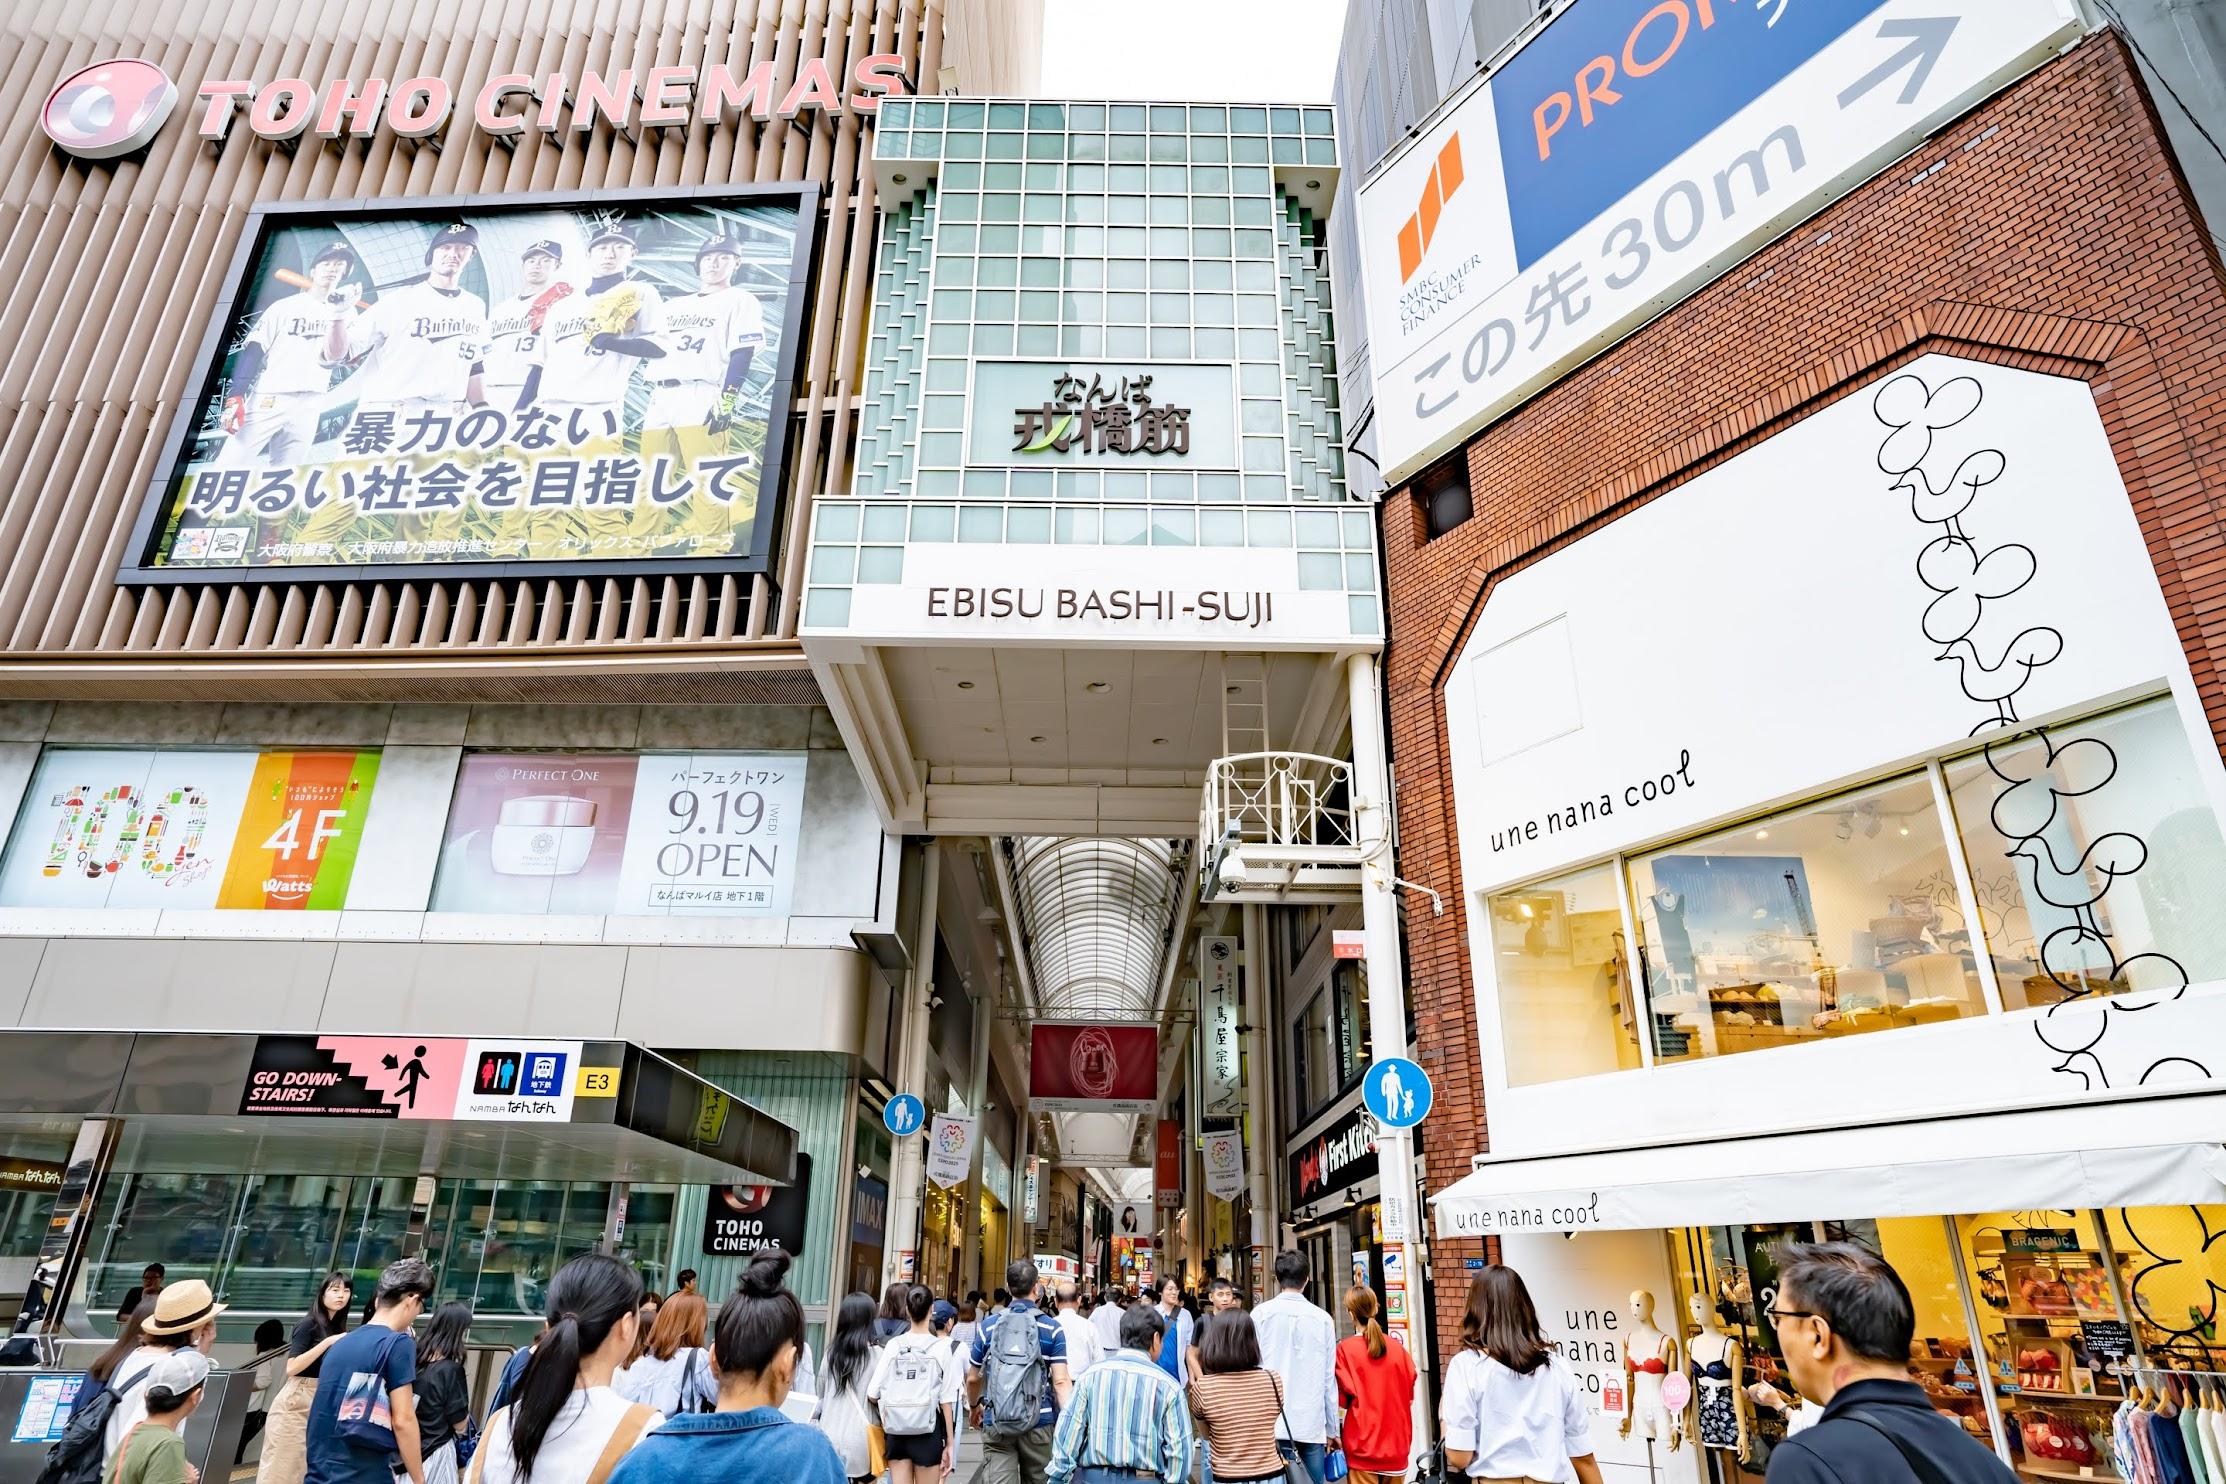 Namba Ebisubashi-Suji Shopping Street